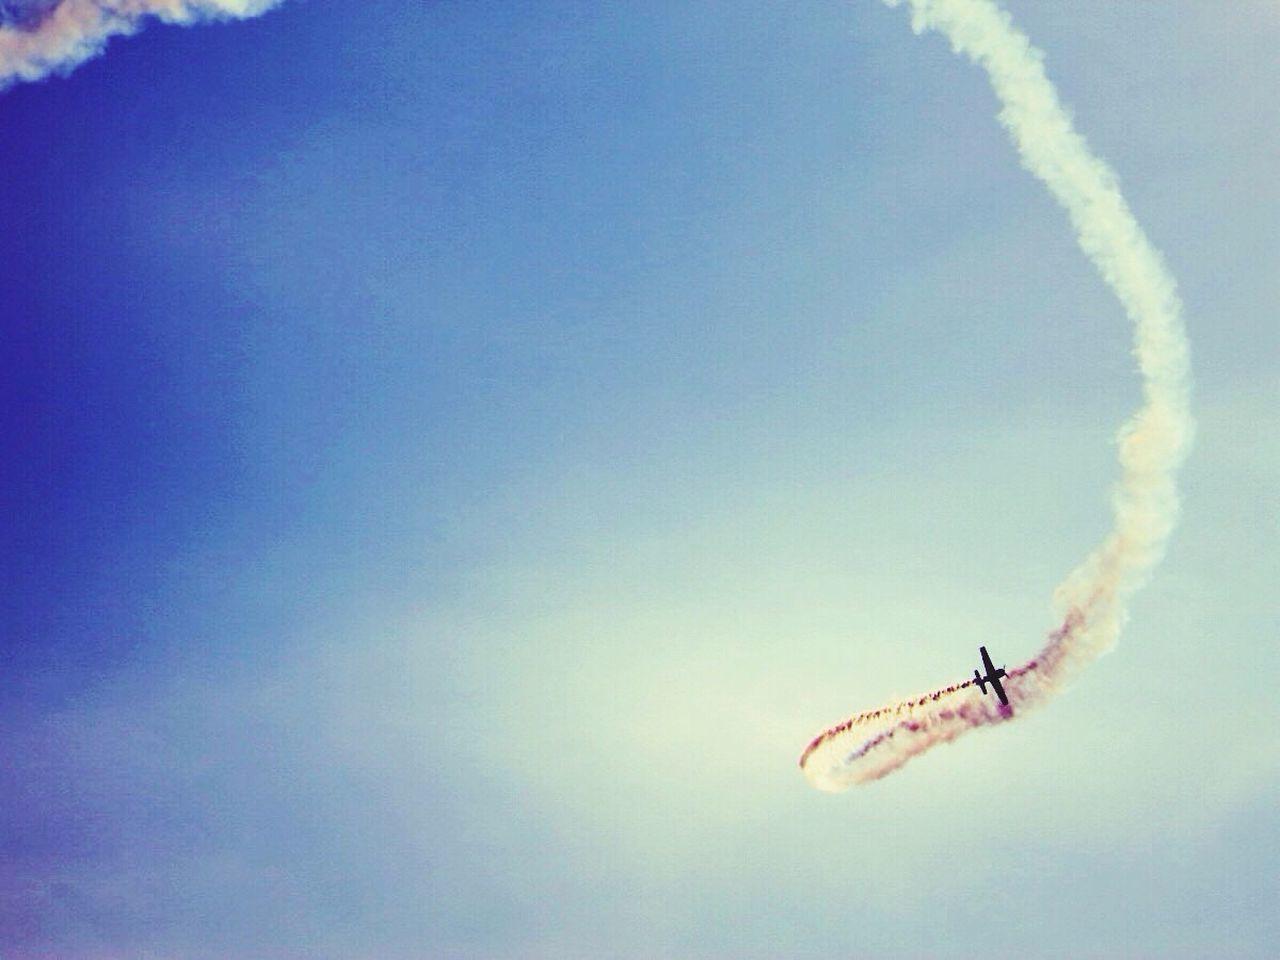 Kunstflug Flugsport Motorflugzeug Sportflieger Aerobatic Flight Aerobatics Flight Flightl Sports Aeroplane Aeroplane In The Sky Looping Turn Airshow Vapor Trail